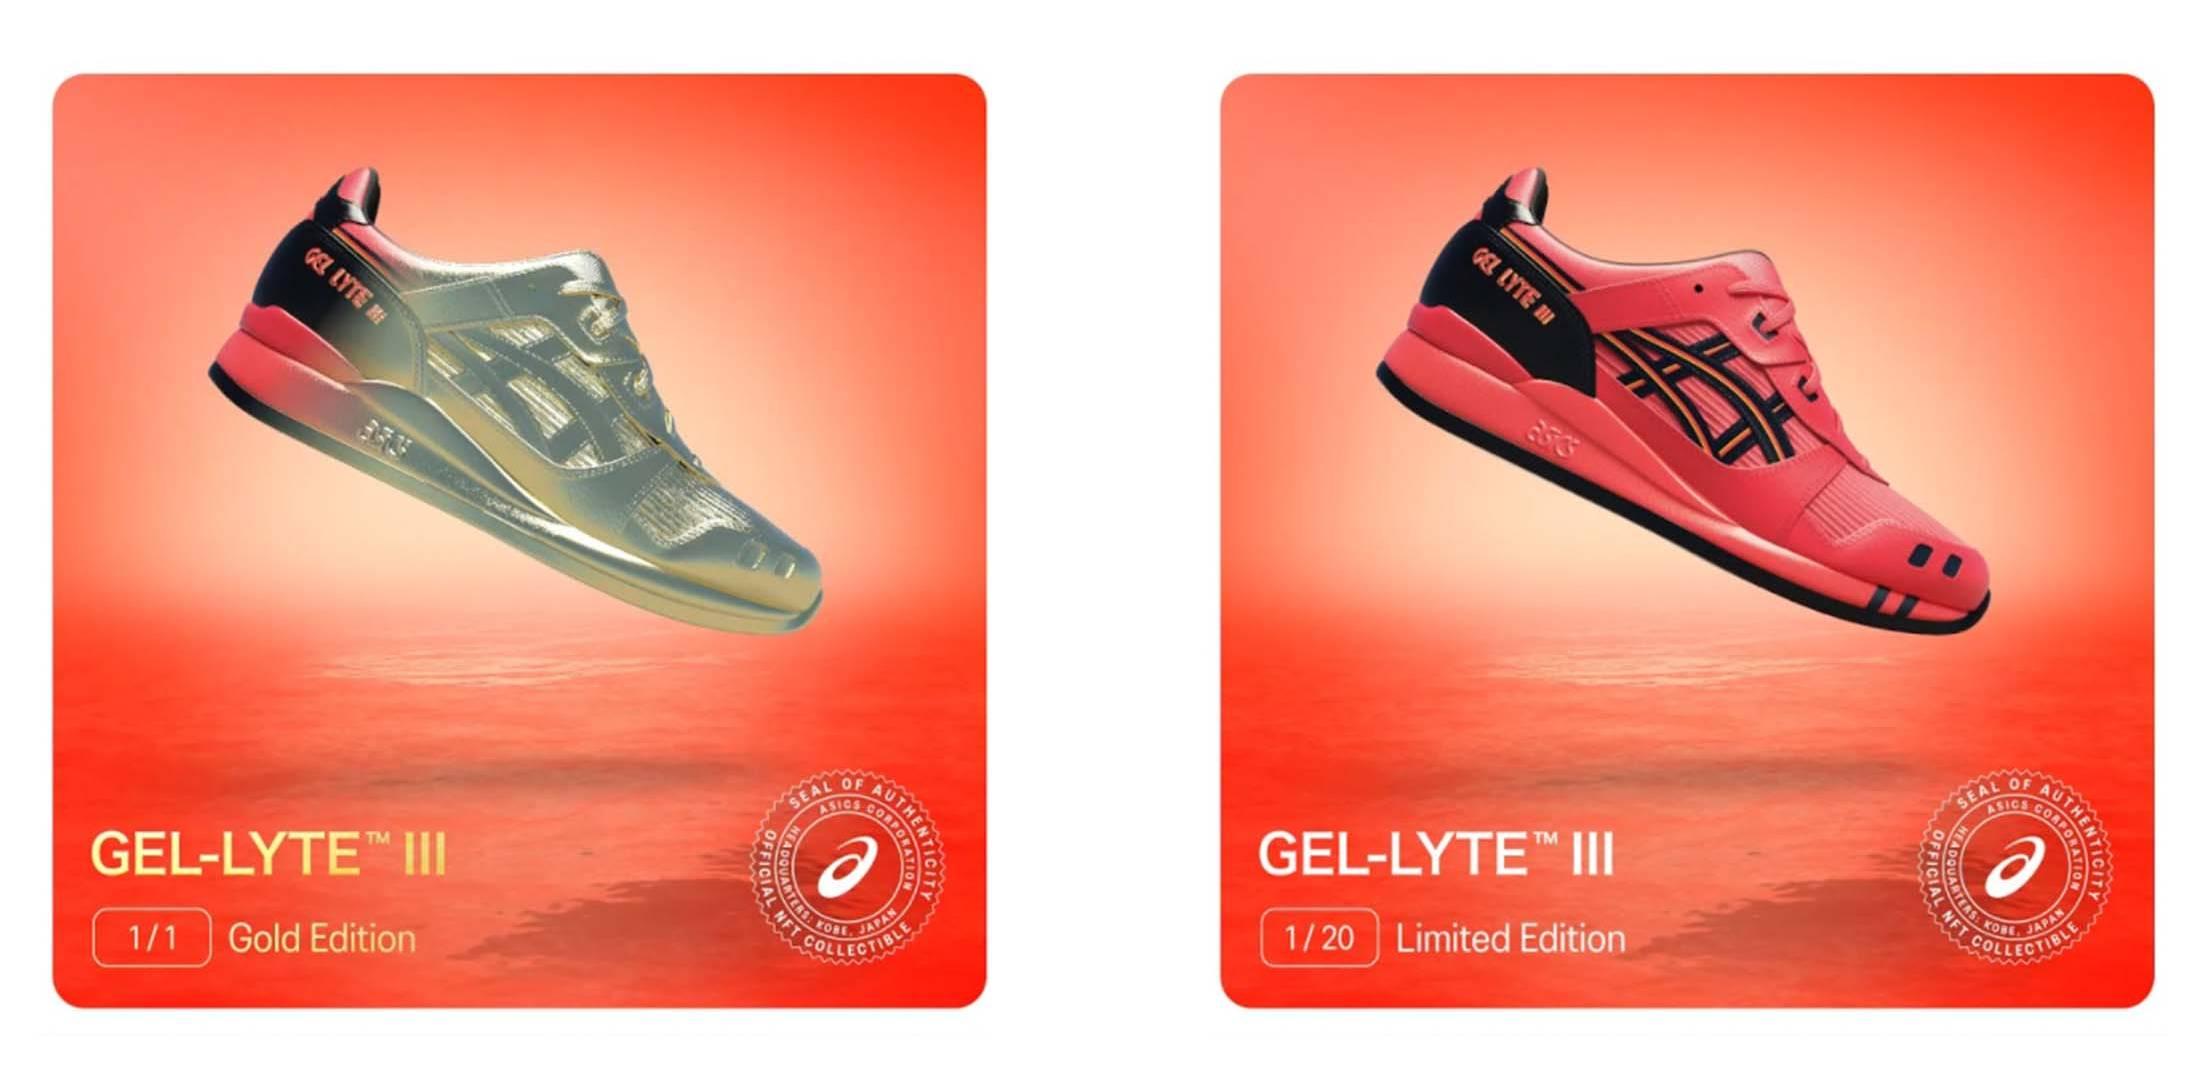 ASICS NFT digital footwear